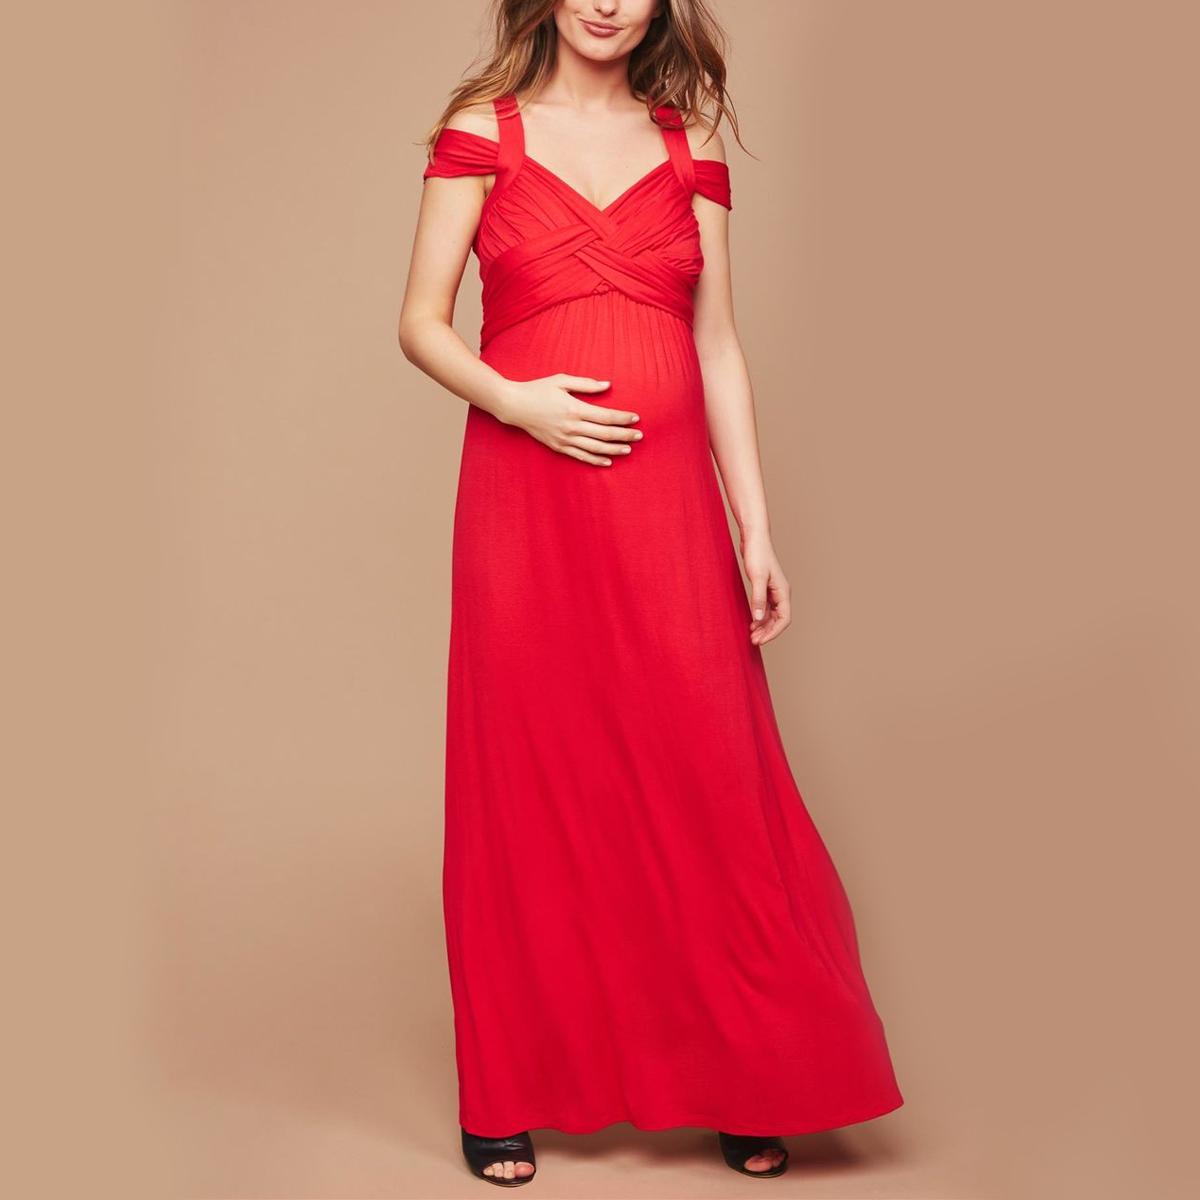 8 Bump-Friendly Maternity Dresses for Wedding Season | Fit Pregnancy ...